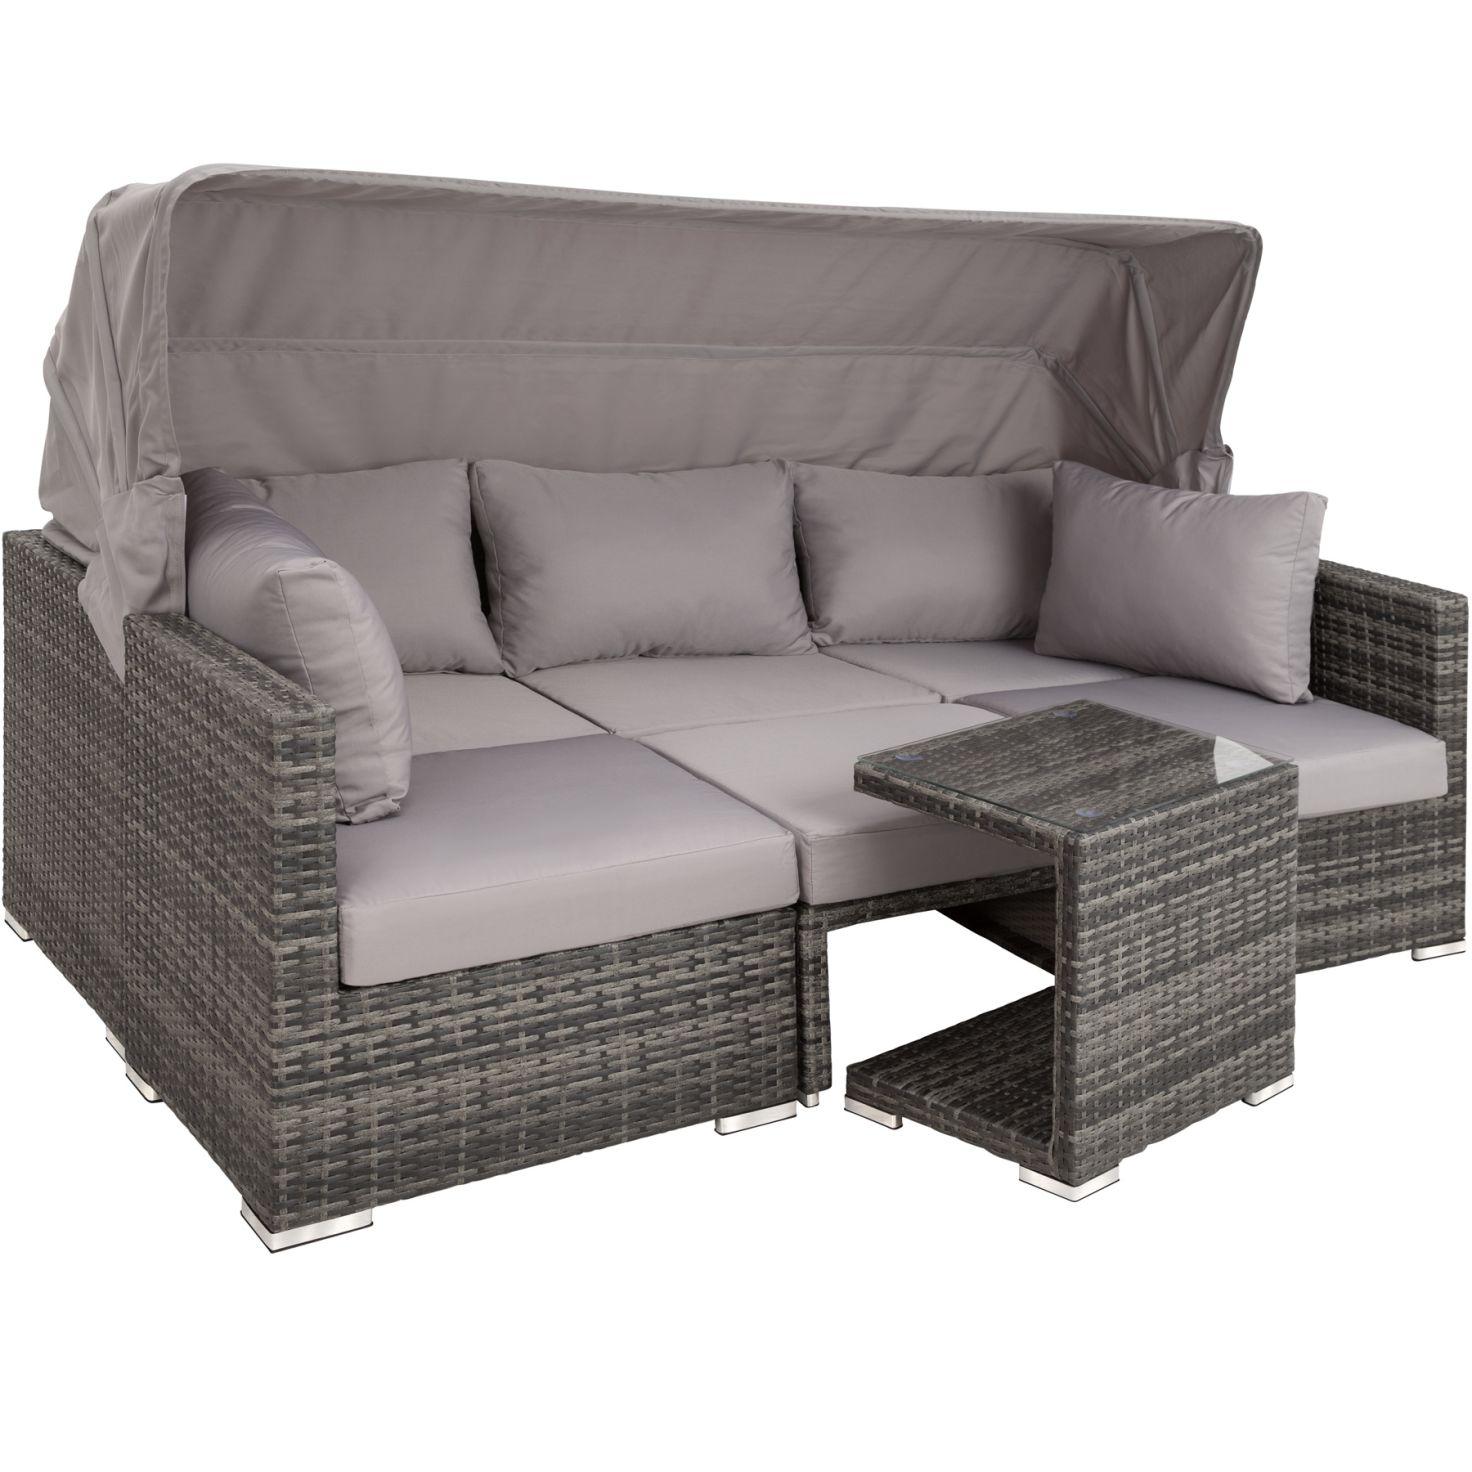 Full Size of Polyrattan Sofa Lounge Outdoor 2 Sitzer Balkon Grau Set Garden Rattan Ausziehbar Couch Tchibo 2 Sitzer Gartensofa Mit Aluminiumgestell San Marino Gnstig Online Sofa Polyrattan Sofa